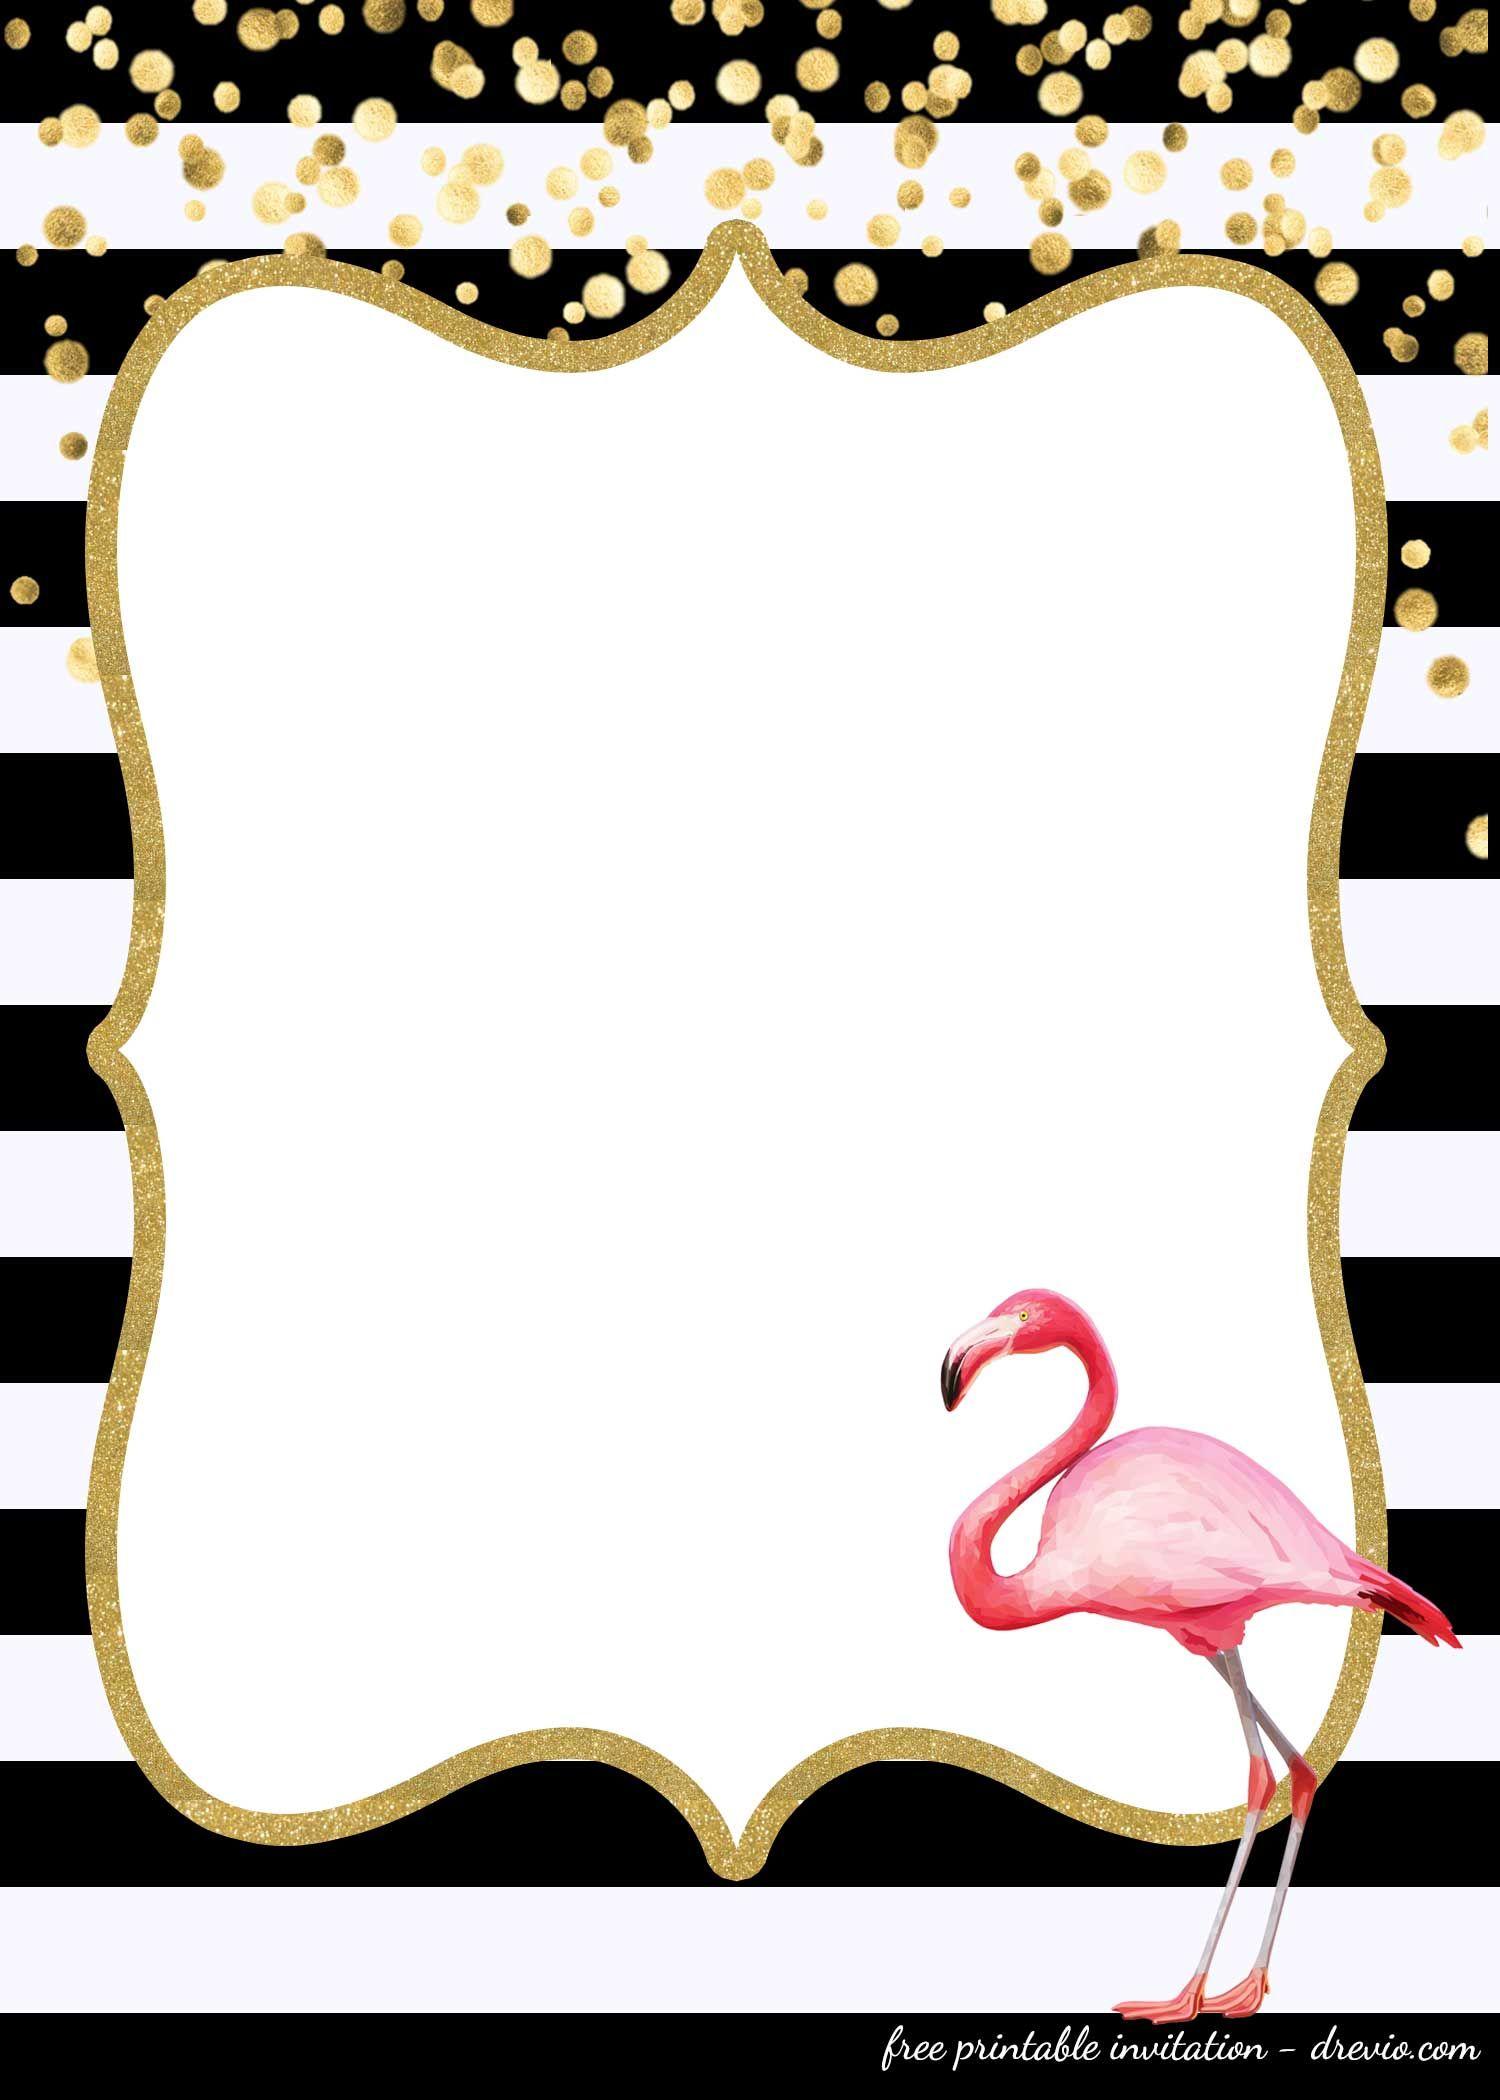 Free Flamingo Invitations Templates Downloadable Free Invitation Templates Dr Flamingo Invitation Flamingo Birthday Invitations Free Invitation Templates